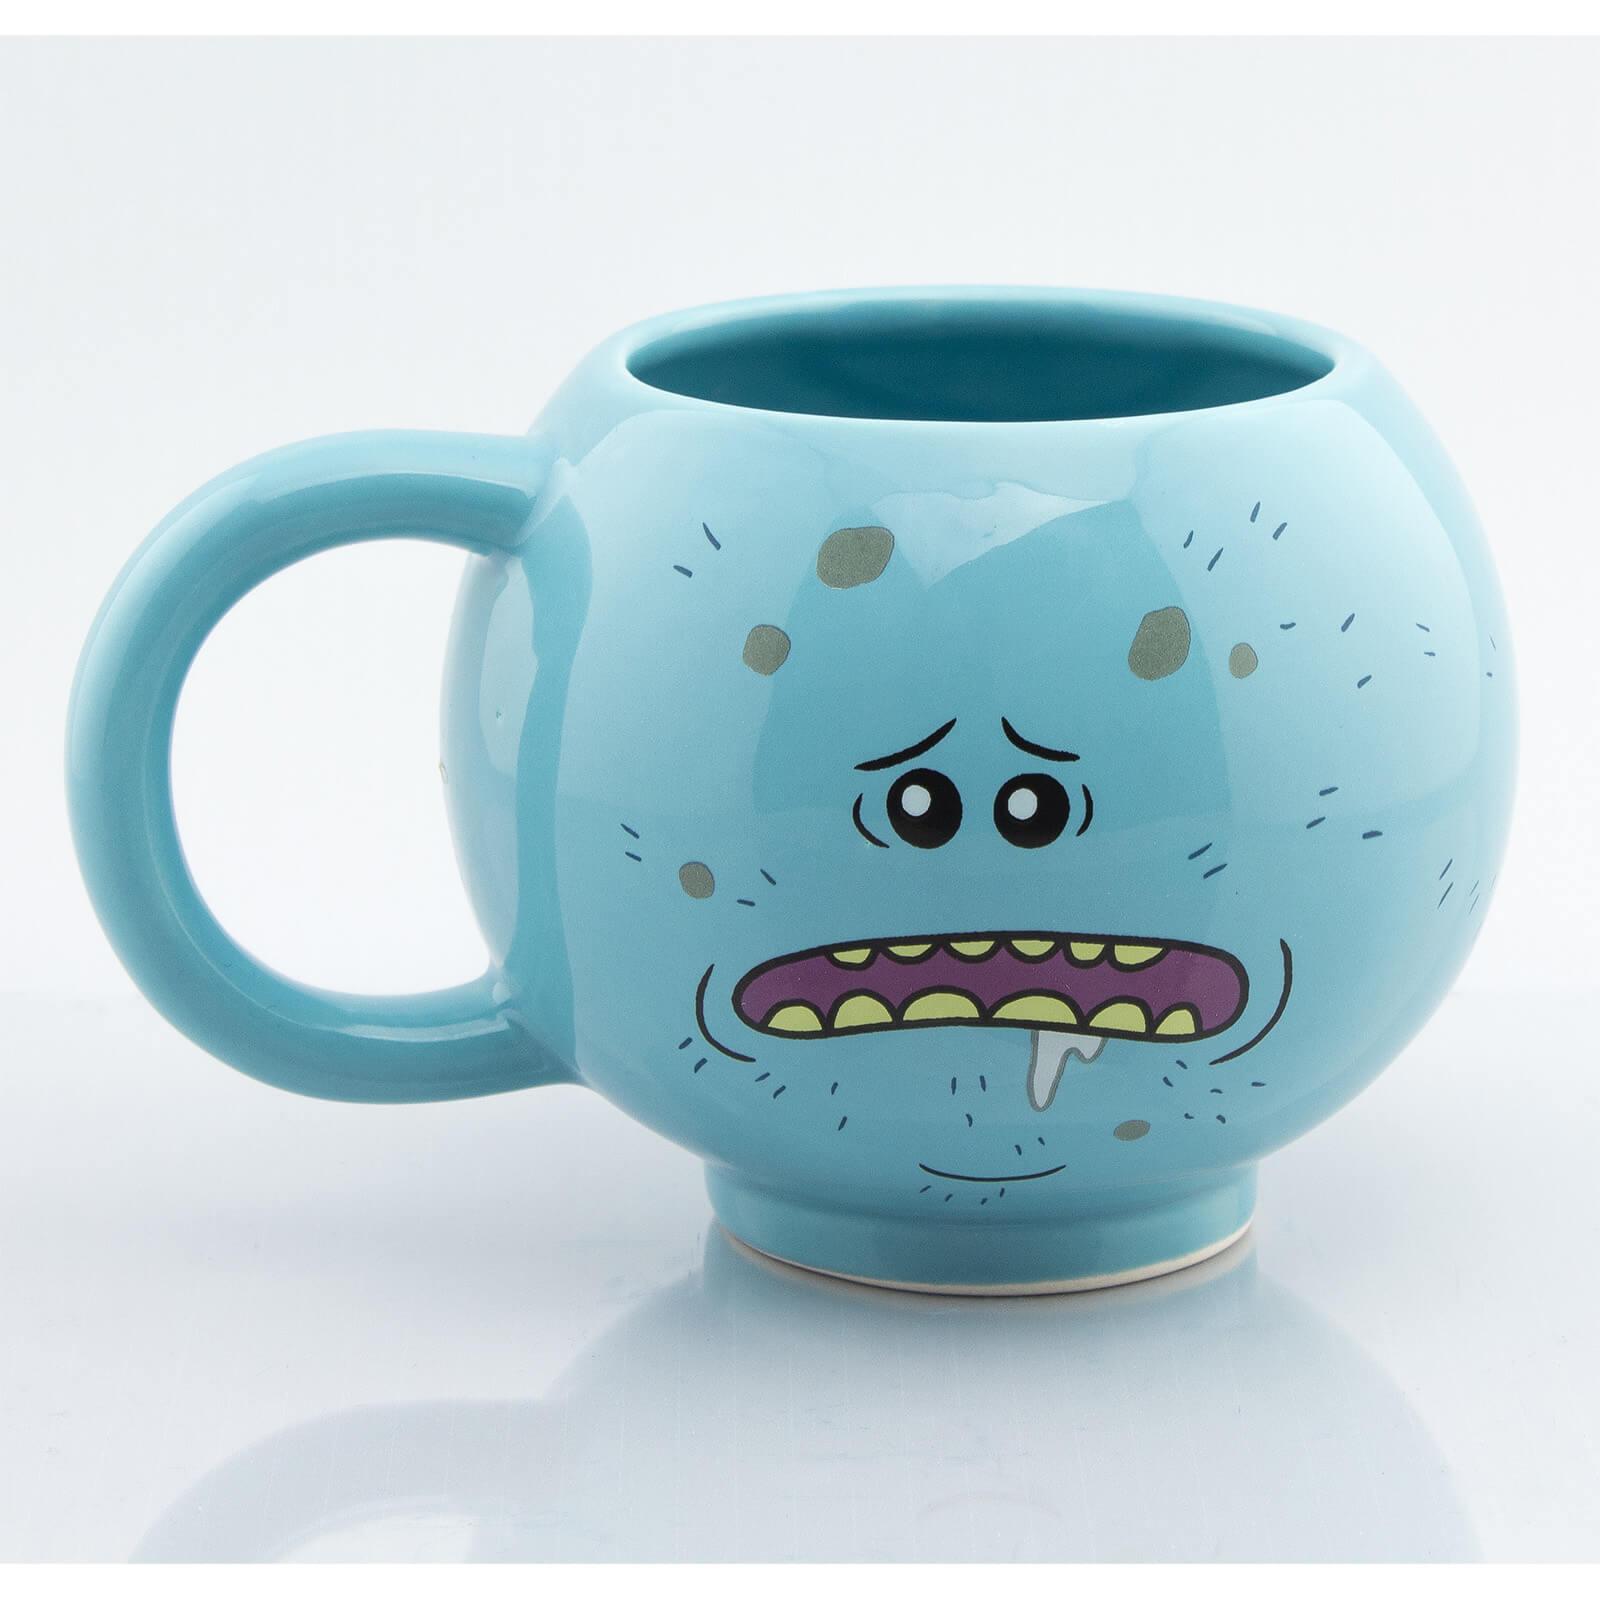 Rick and Morty Mr. Meeseeks Tasse für 7,87€ inkl. Versand (Zavvi UK)